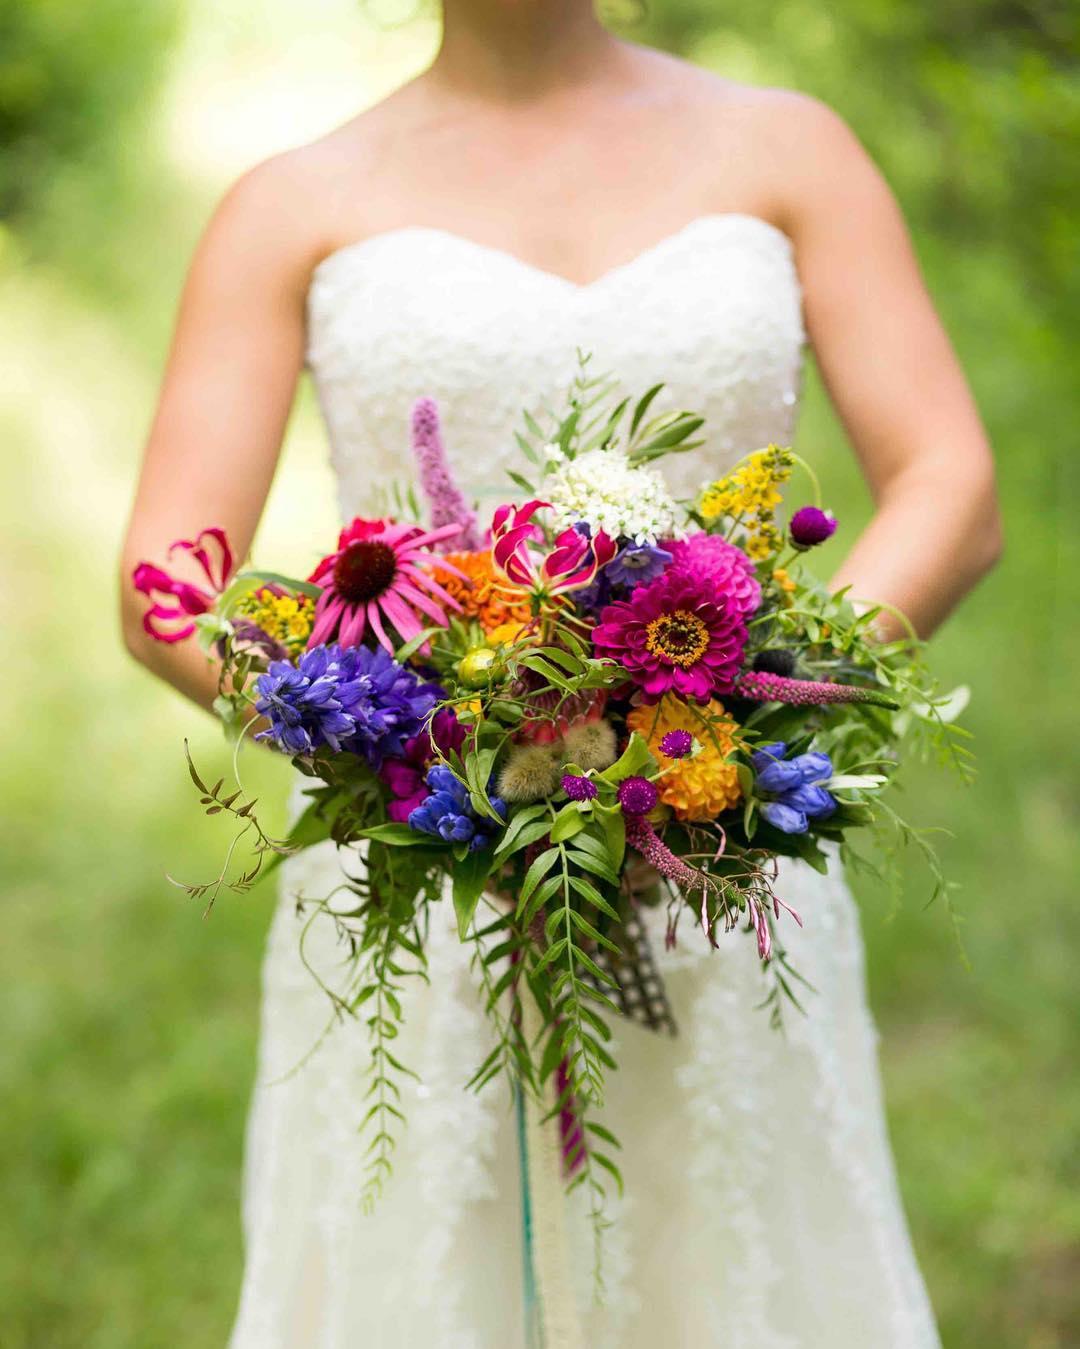 {boho} photo | @alisonmariephotography  #bohobride #bohobouquet #color #jeweltones #awesomeness #weddingflorist #lotusfloraldesigns #bridebook #theknot #stylemepretty